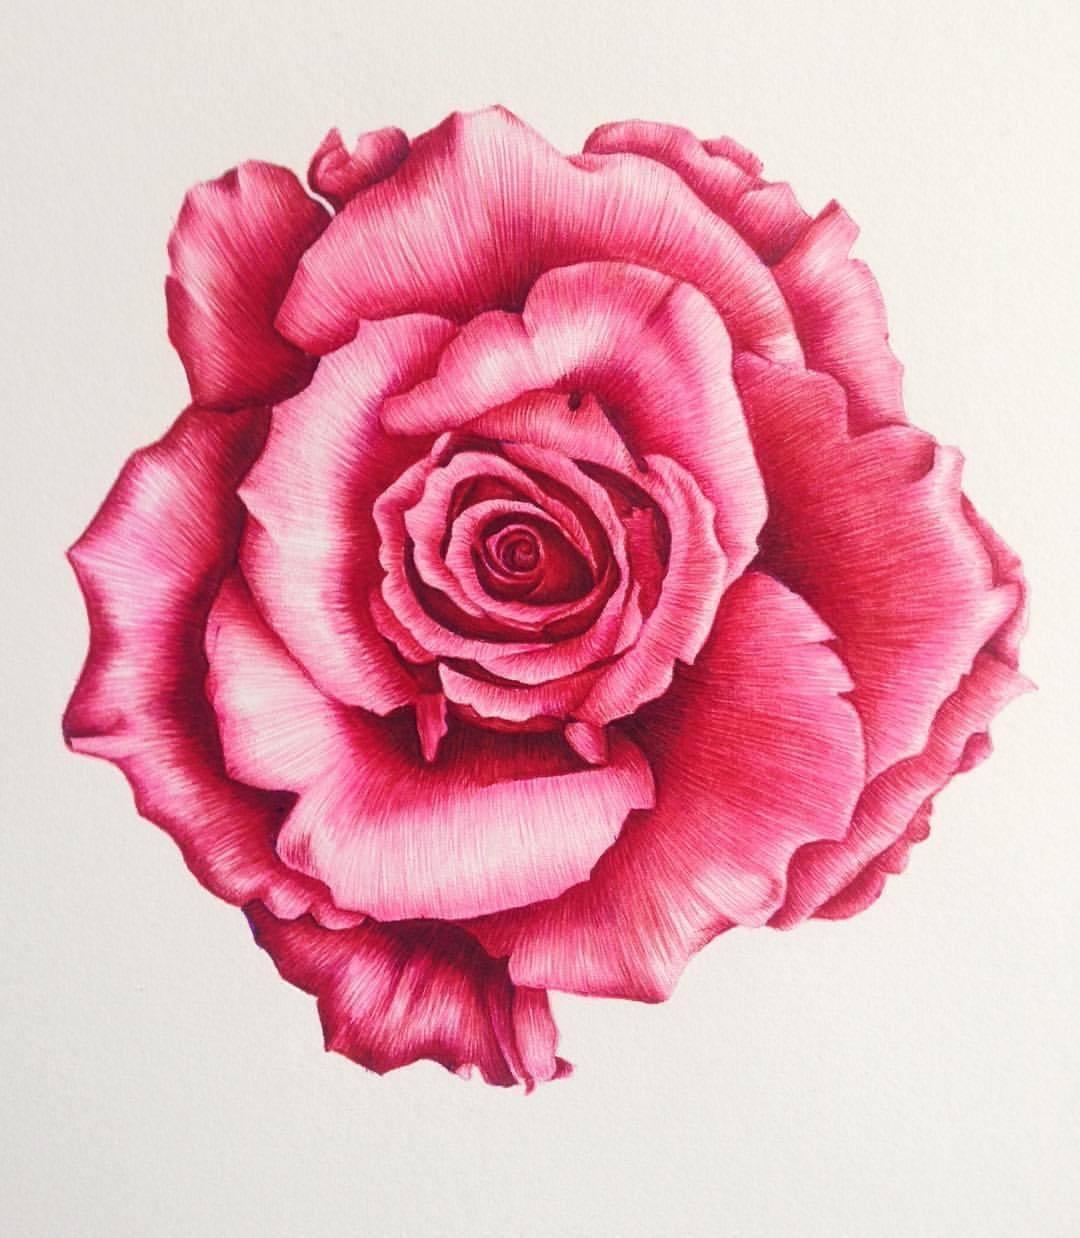 Drawn red rose biro #botanicalart #artist — Botanical #art